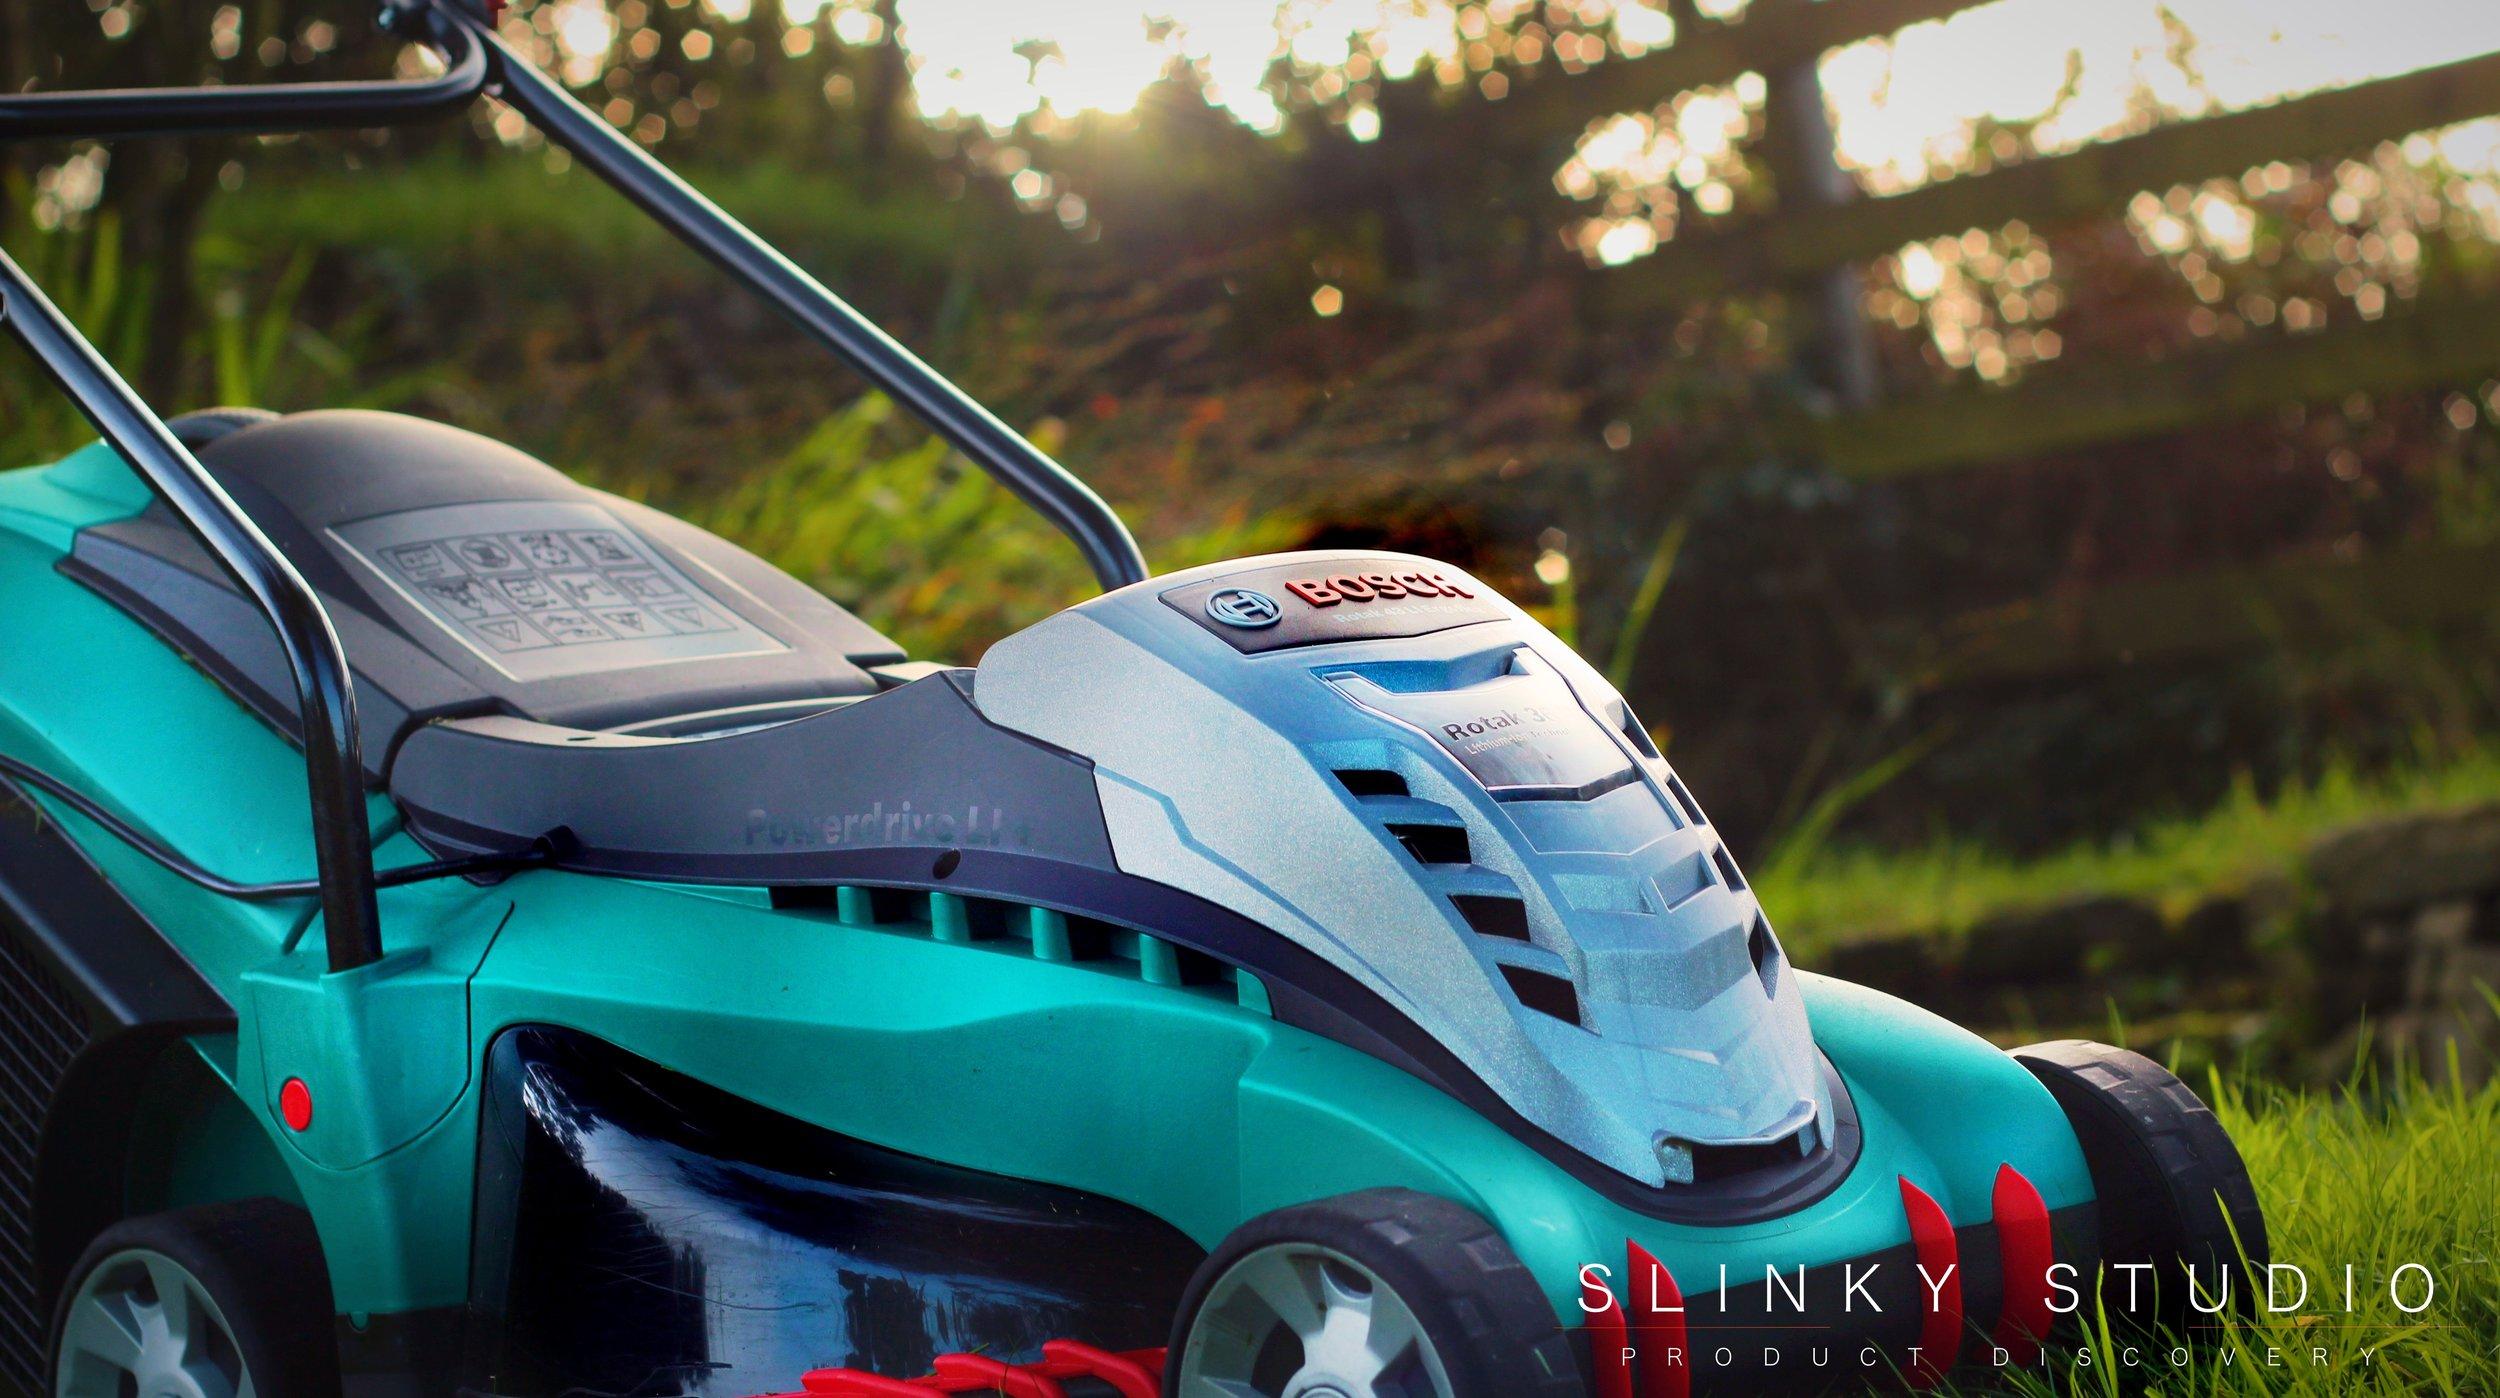 Bosch Rotak 43 LI Ergoflex Cordless Lawnmower Dusk Lighting Through Fence.jpg